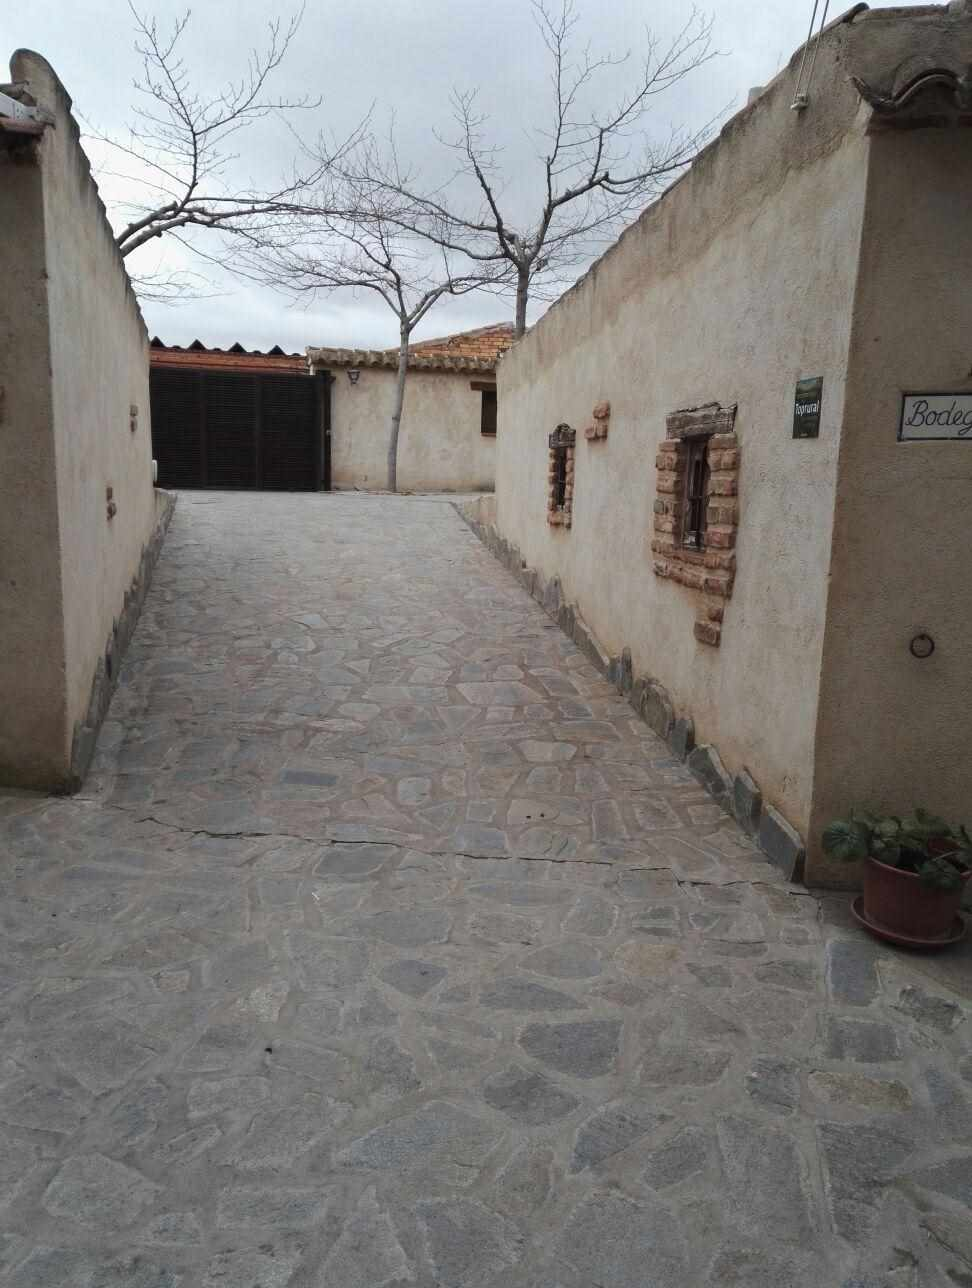 Alquiler vacacional Gálvez, Toledo